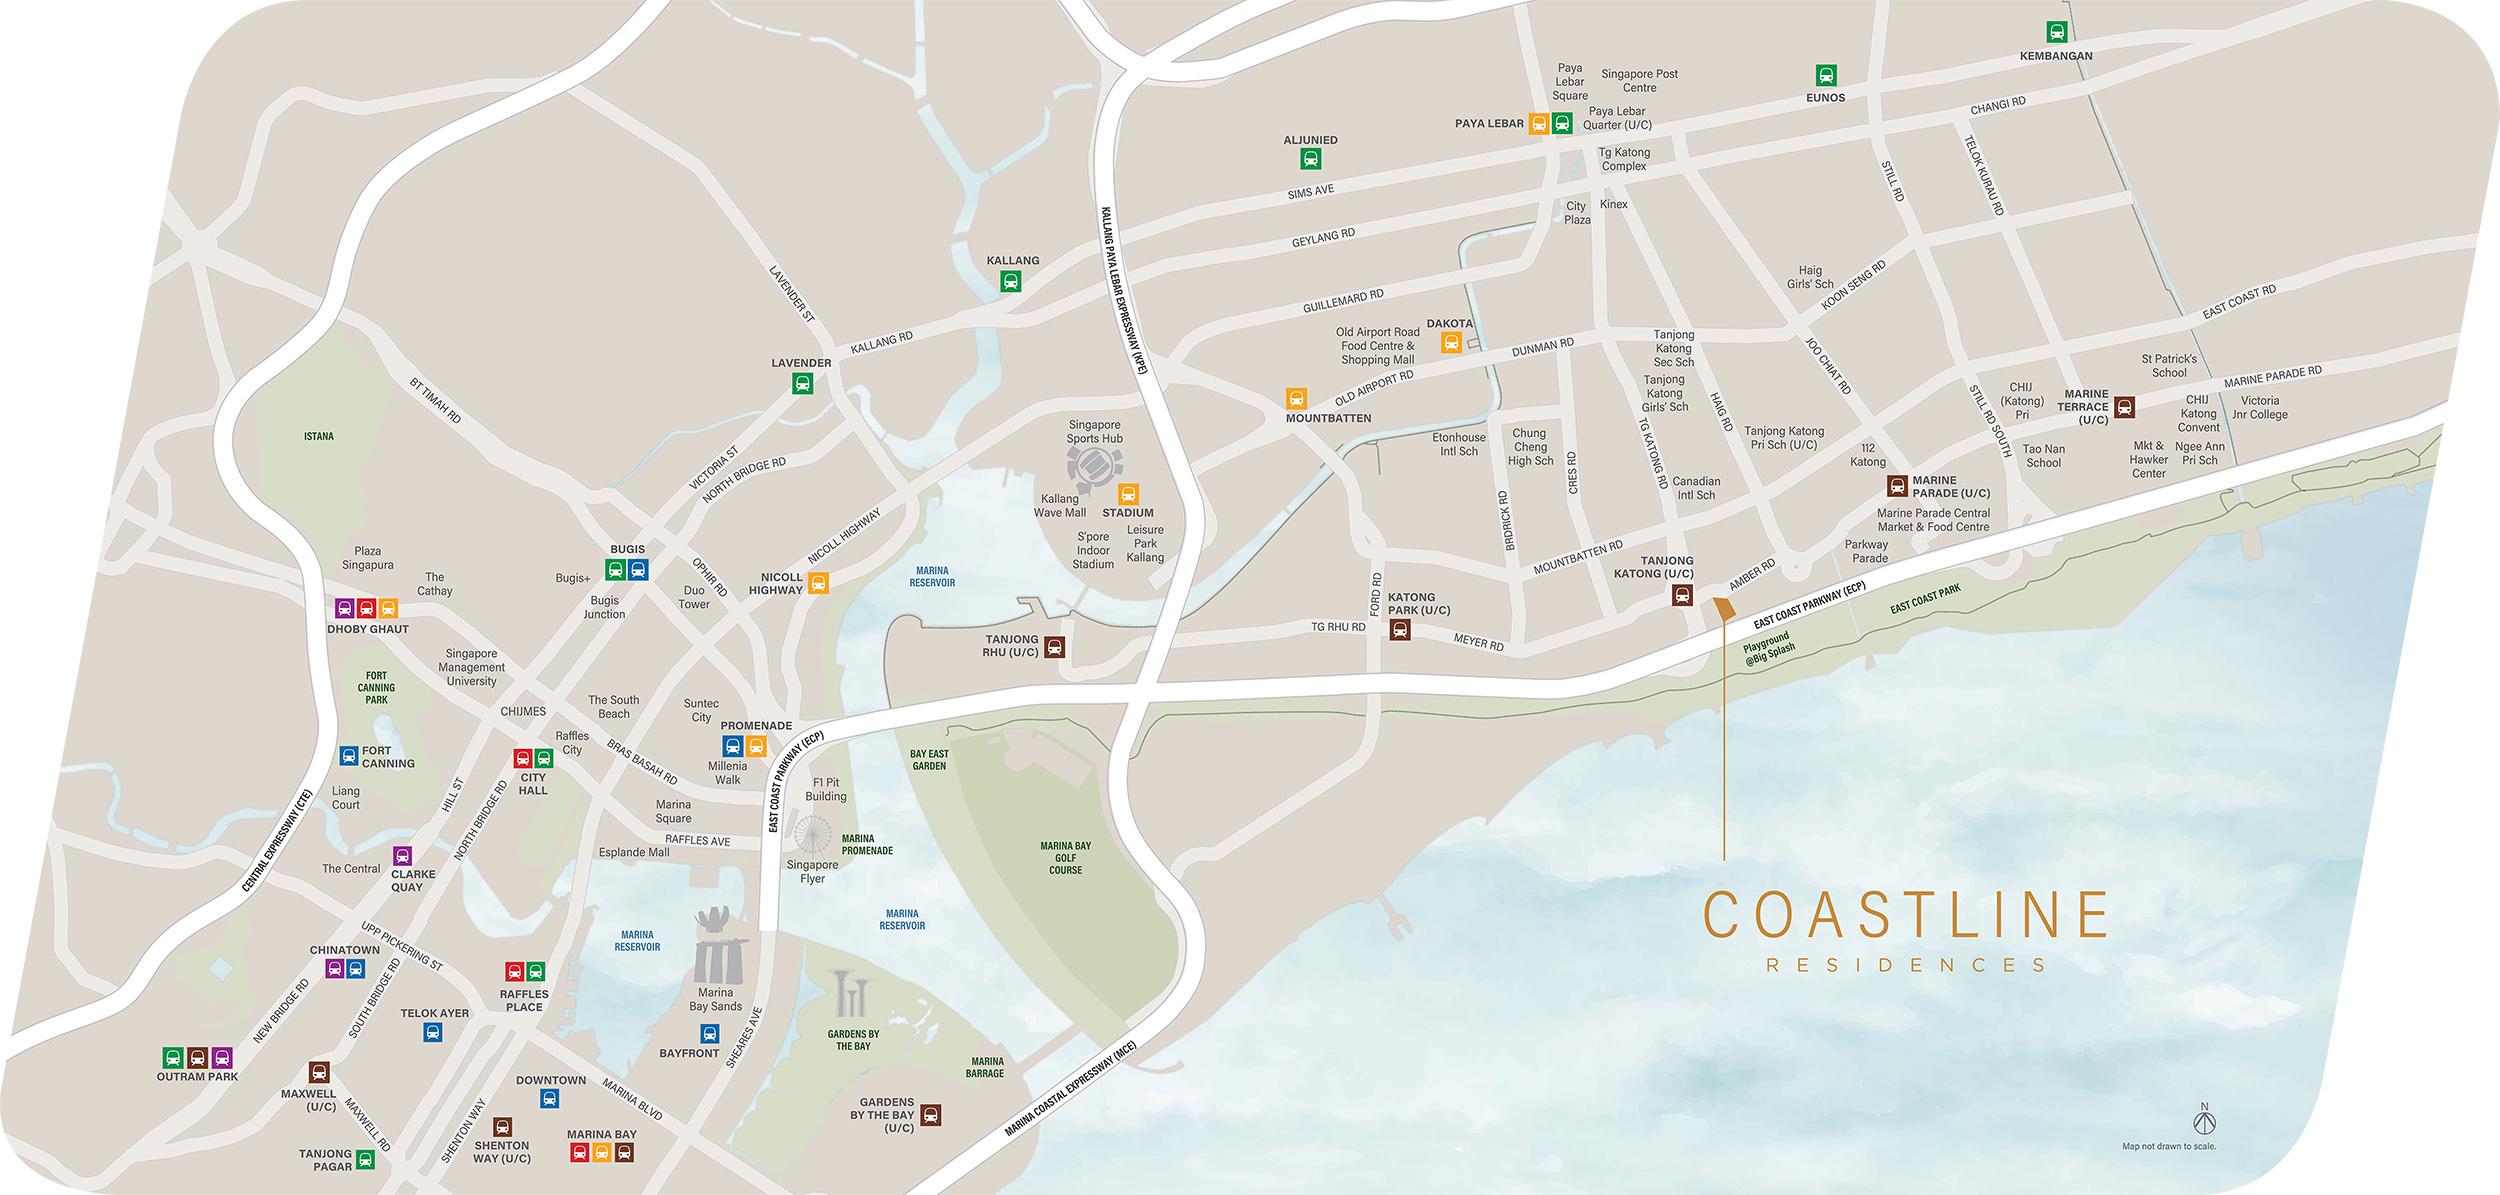 new-condo-singapore-coastline-residences-location-map